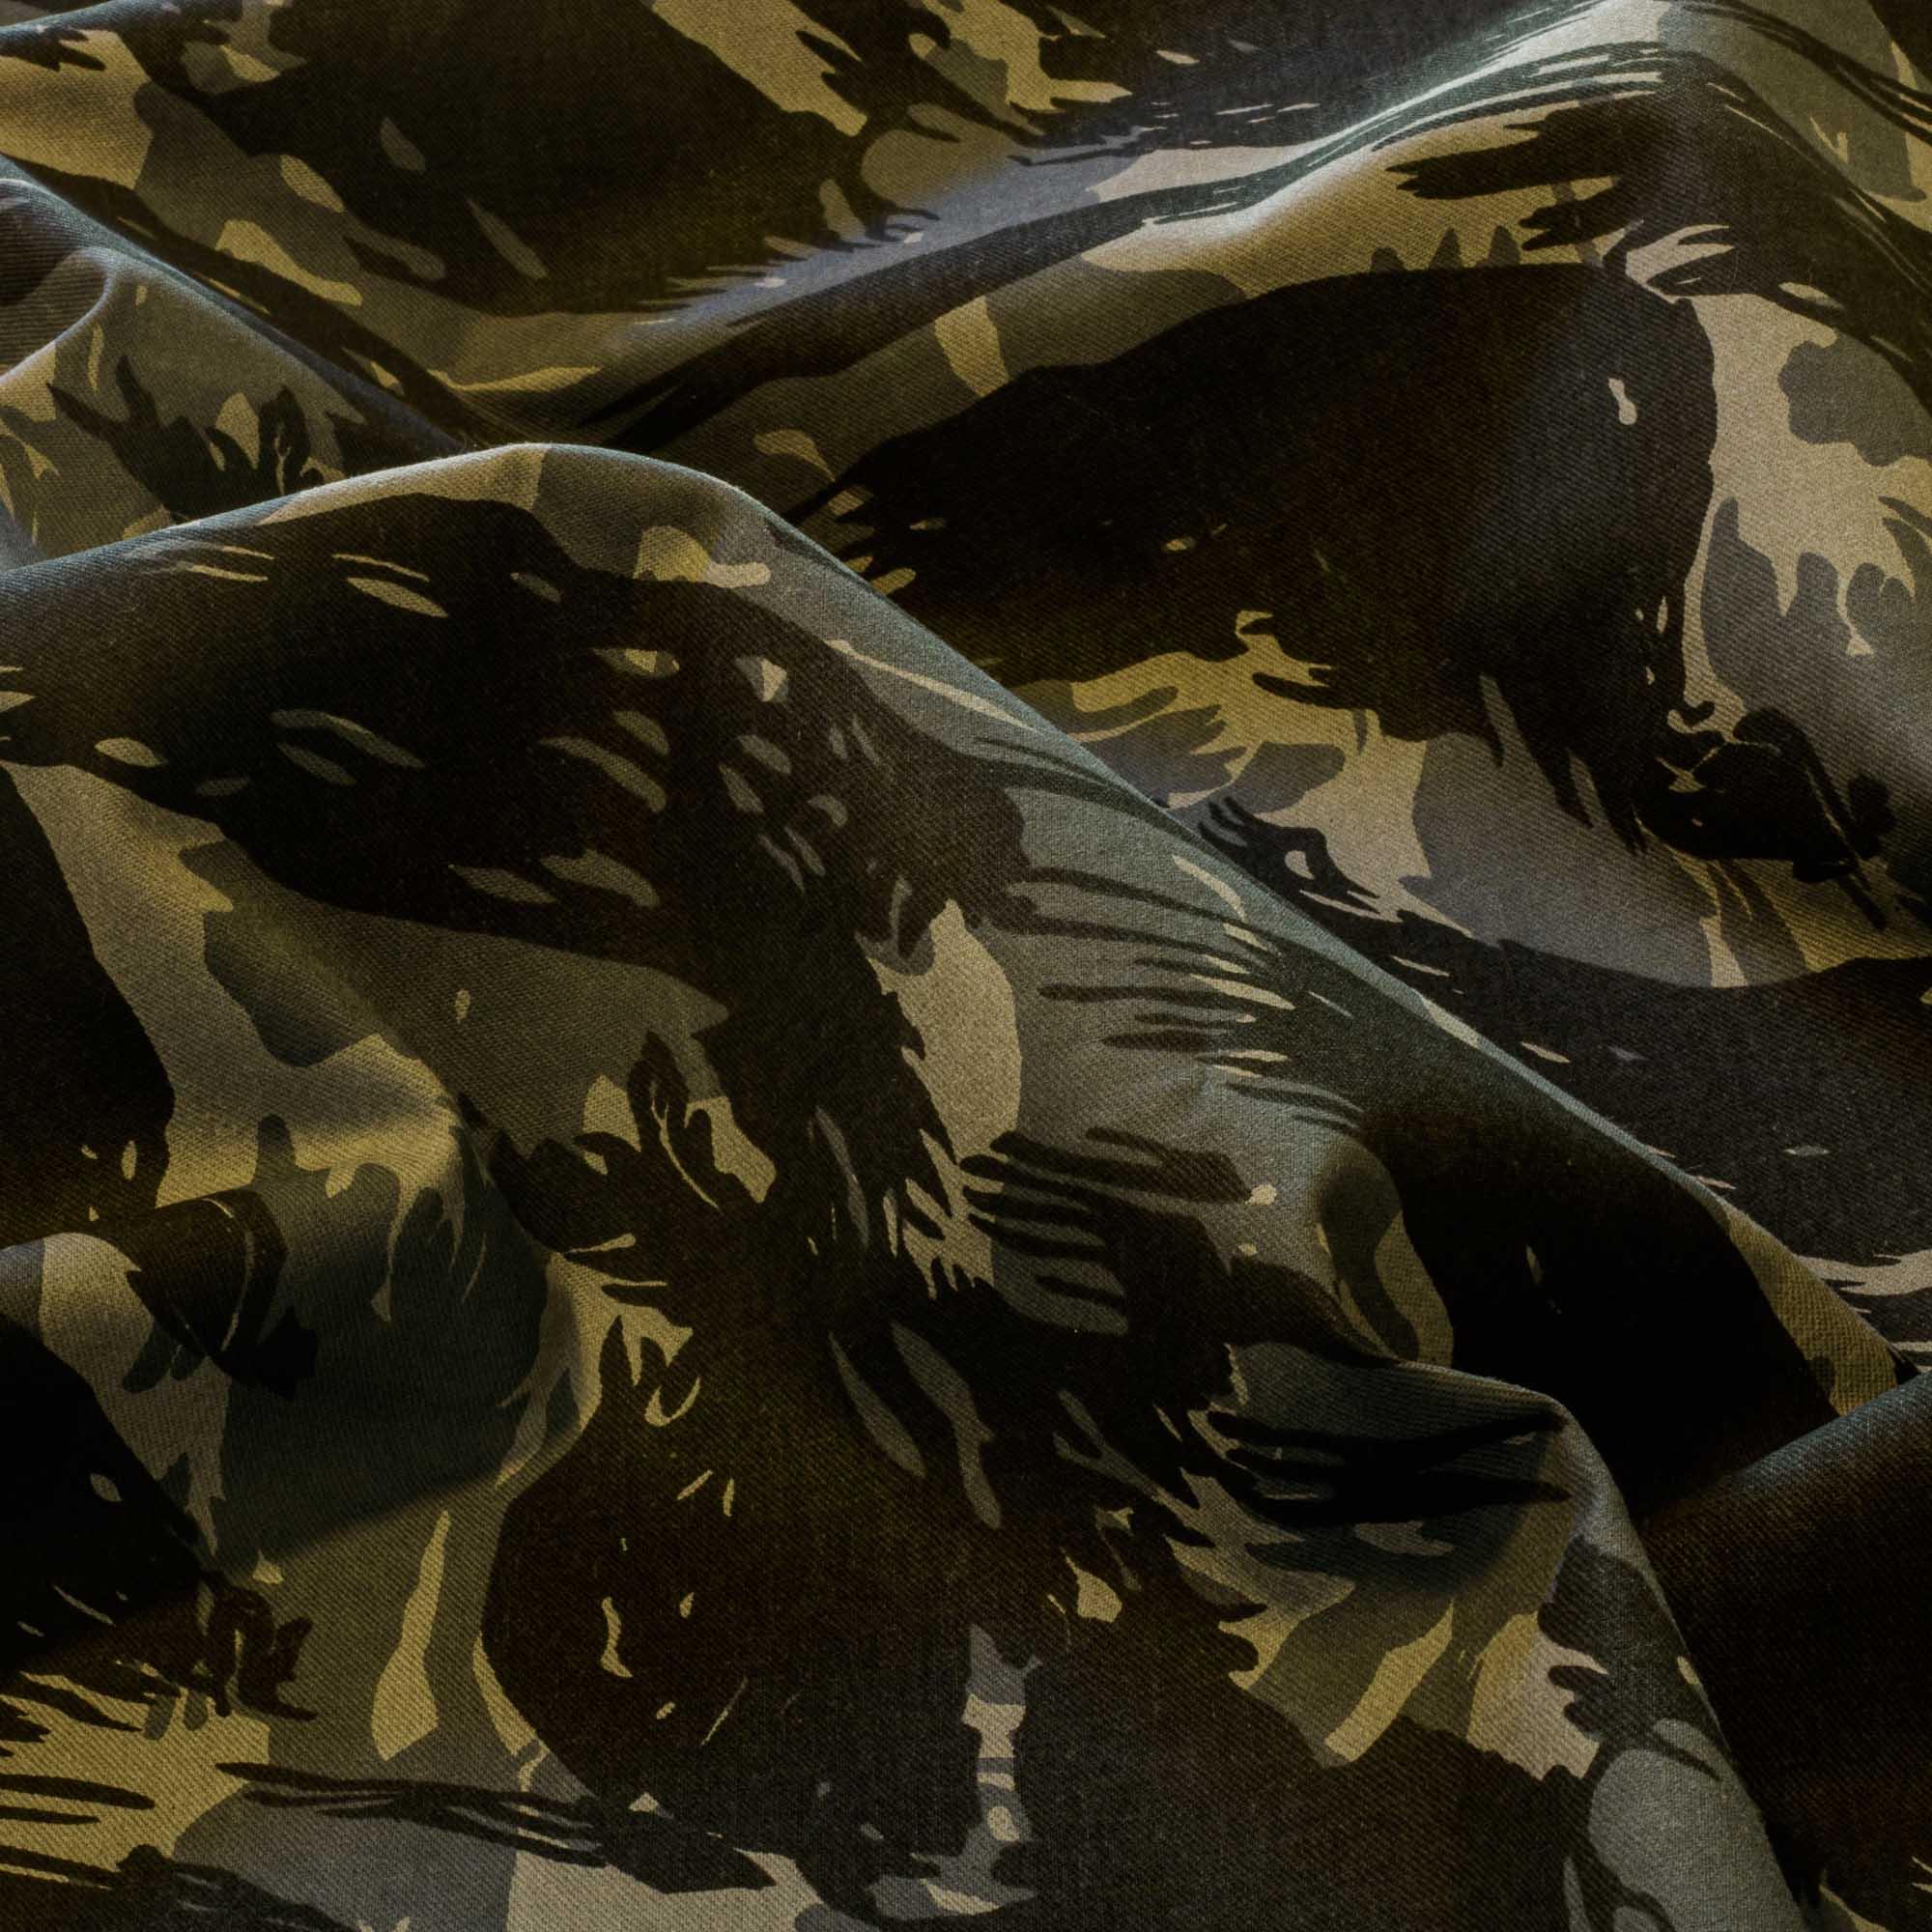 Tecido Sarja Camuflada Cinza Preto 100% Algodão 1,60 Mt Largura